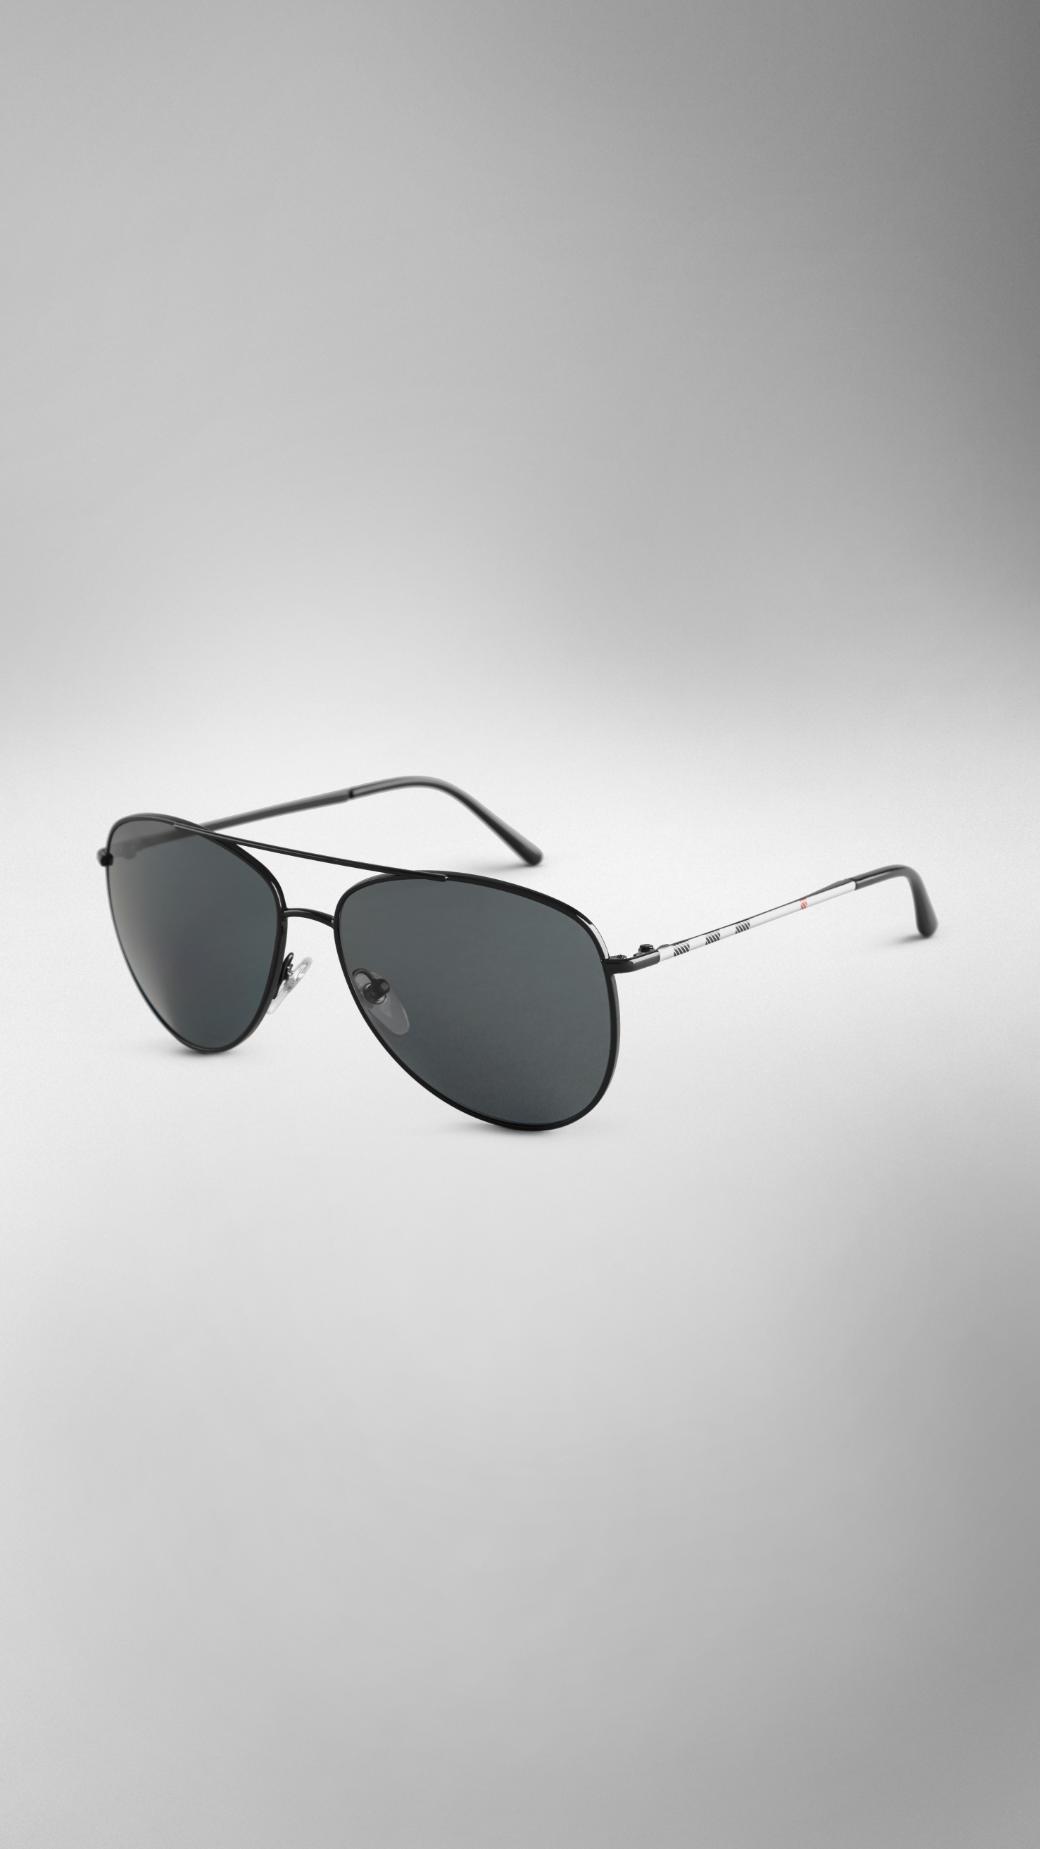 1c083c5c8f2 Lyst - Burberry Check Arm Aviator Sunglasses in Black